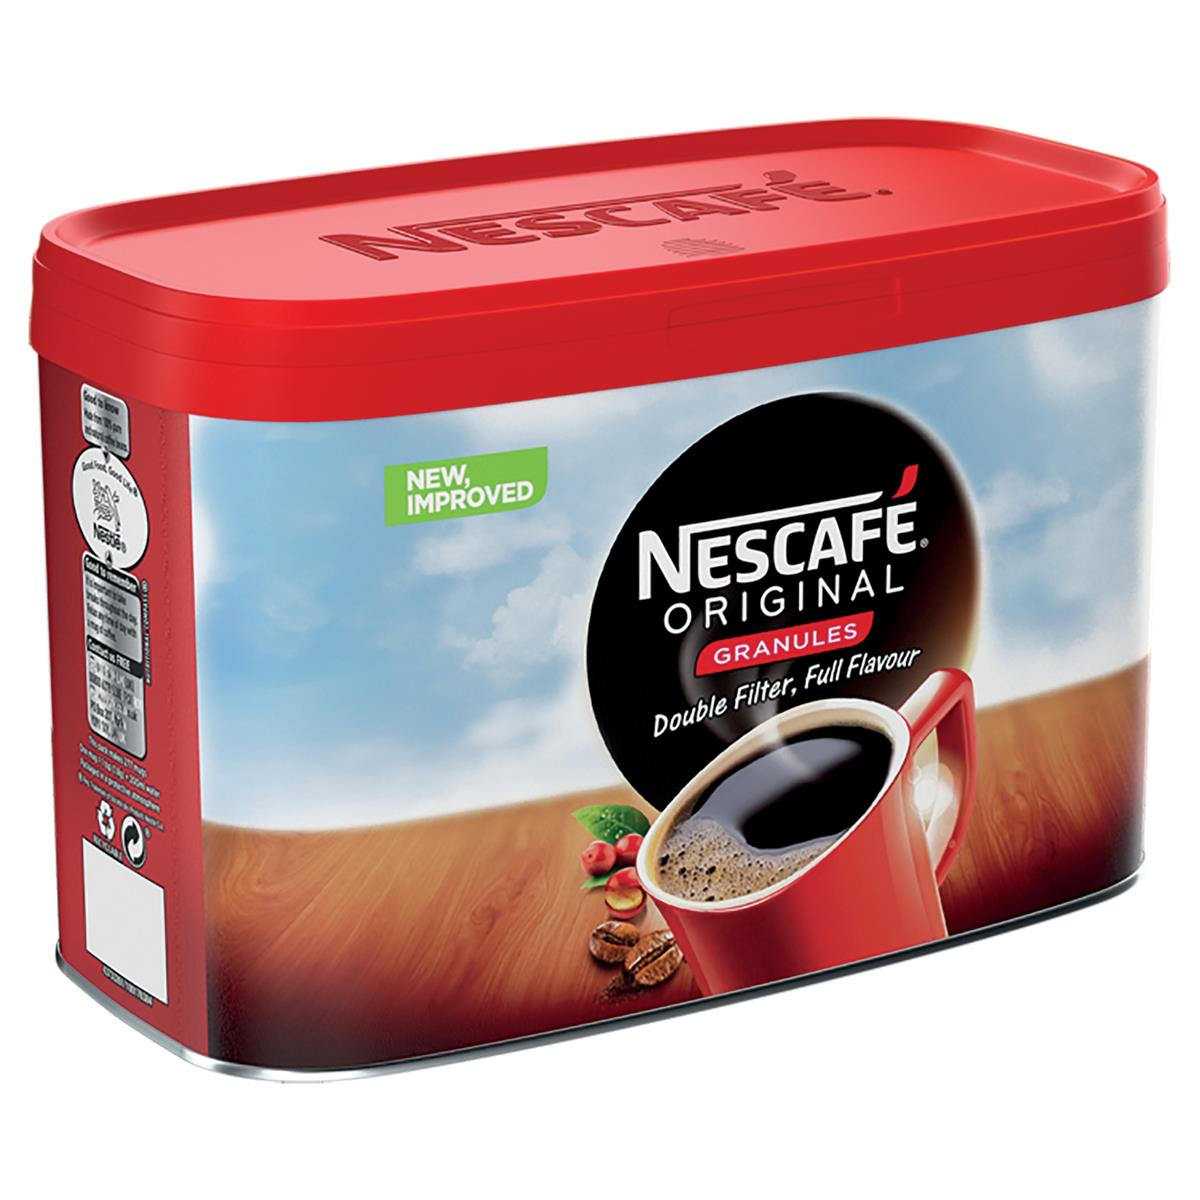 Nescafe Original Instant Coffee Granules Tin 500g Ref 12295139